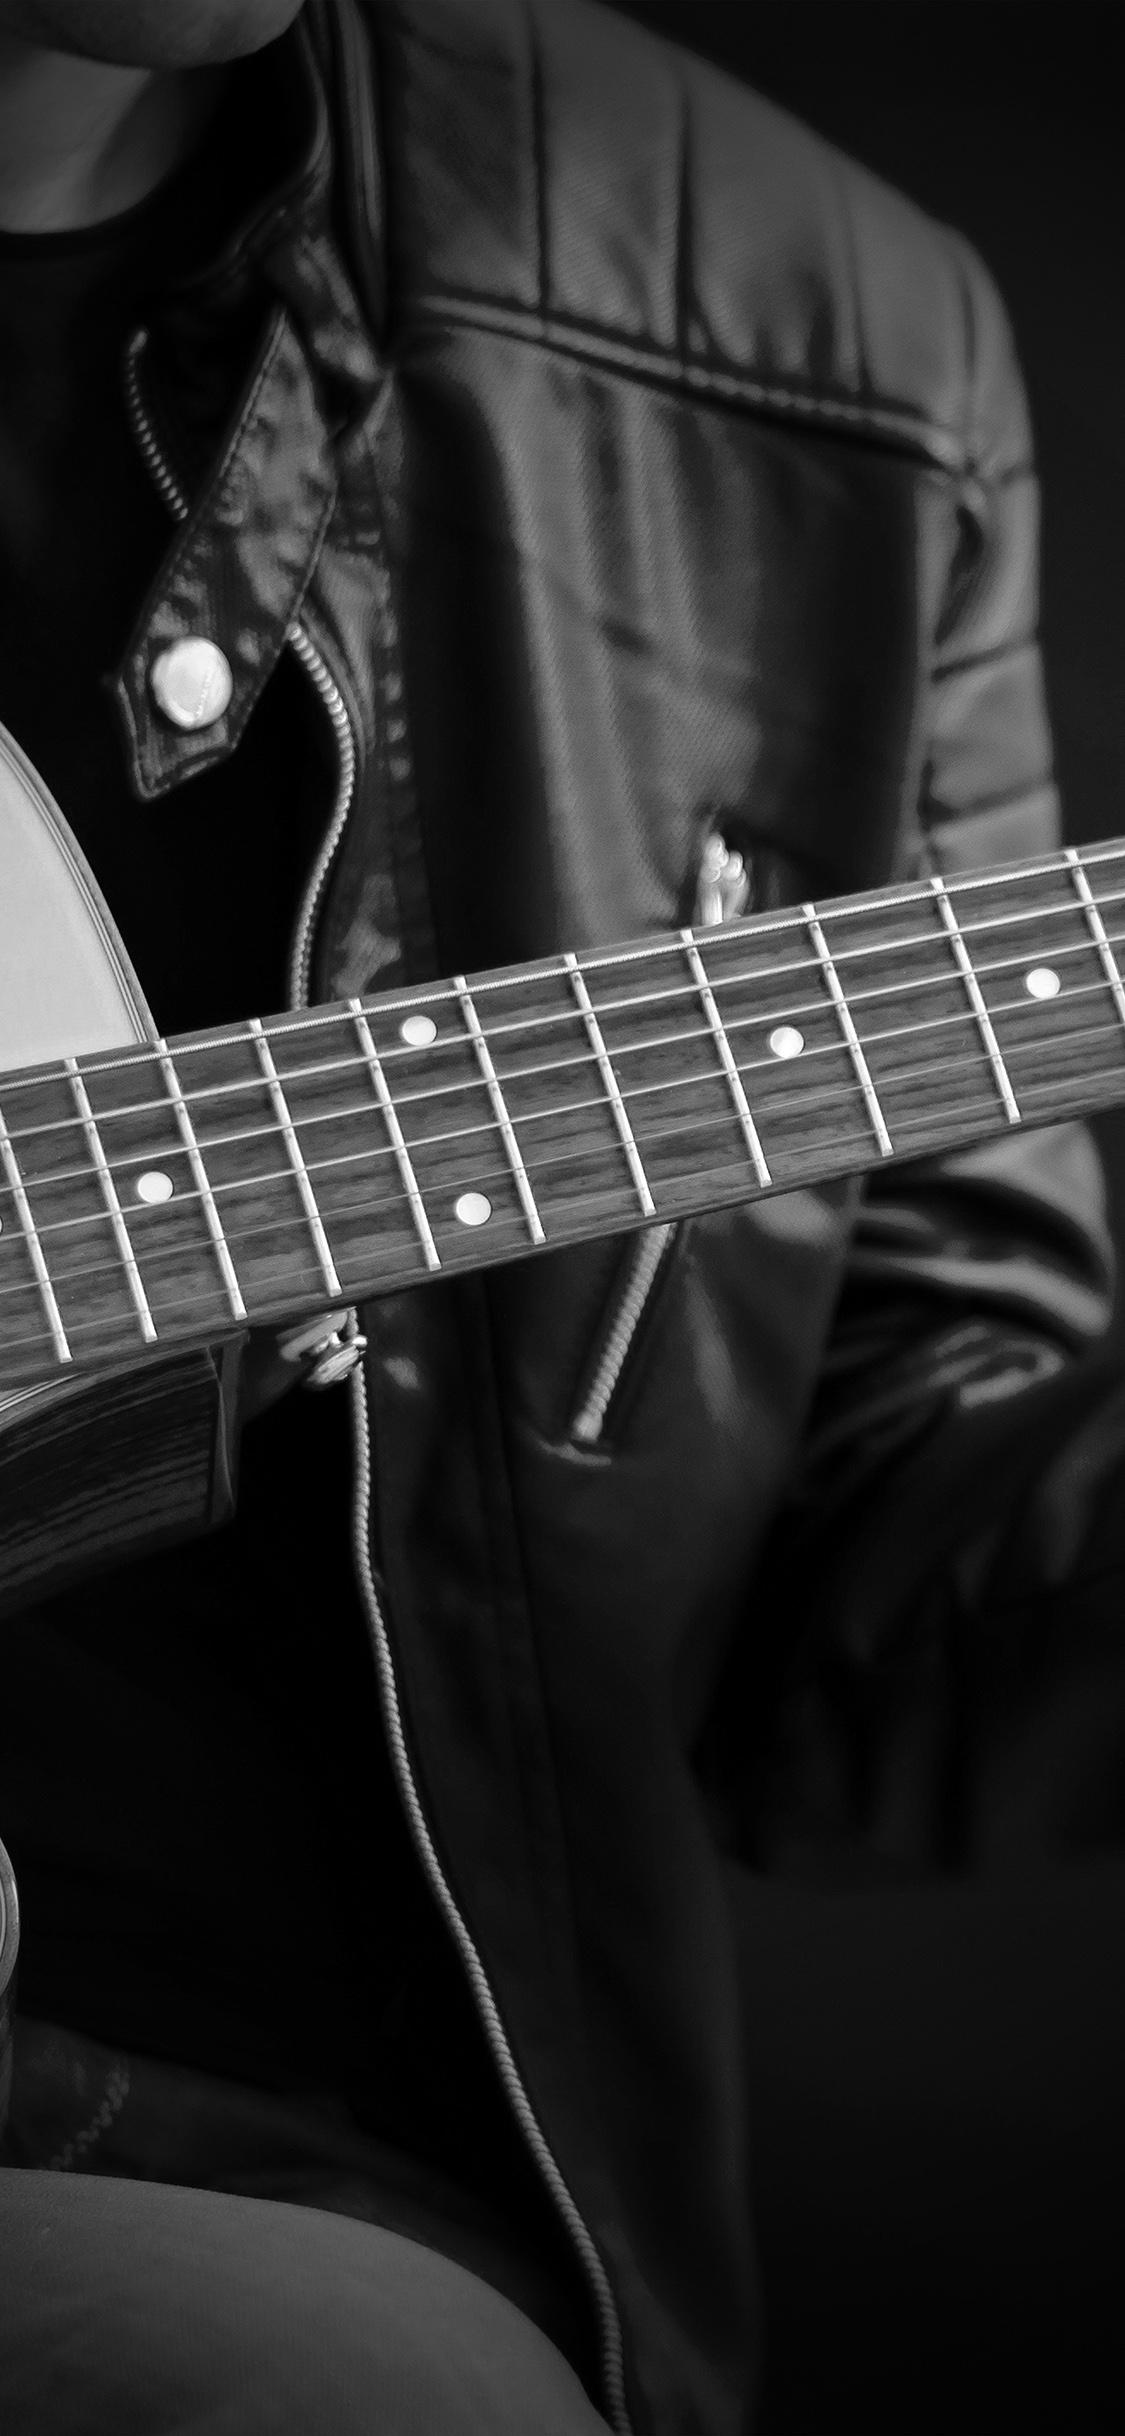 iPhonexpapers.com-Apple-iPhone-wallpaper-nc11-guitar-classical-music-art-guy-bw-dark